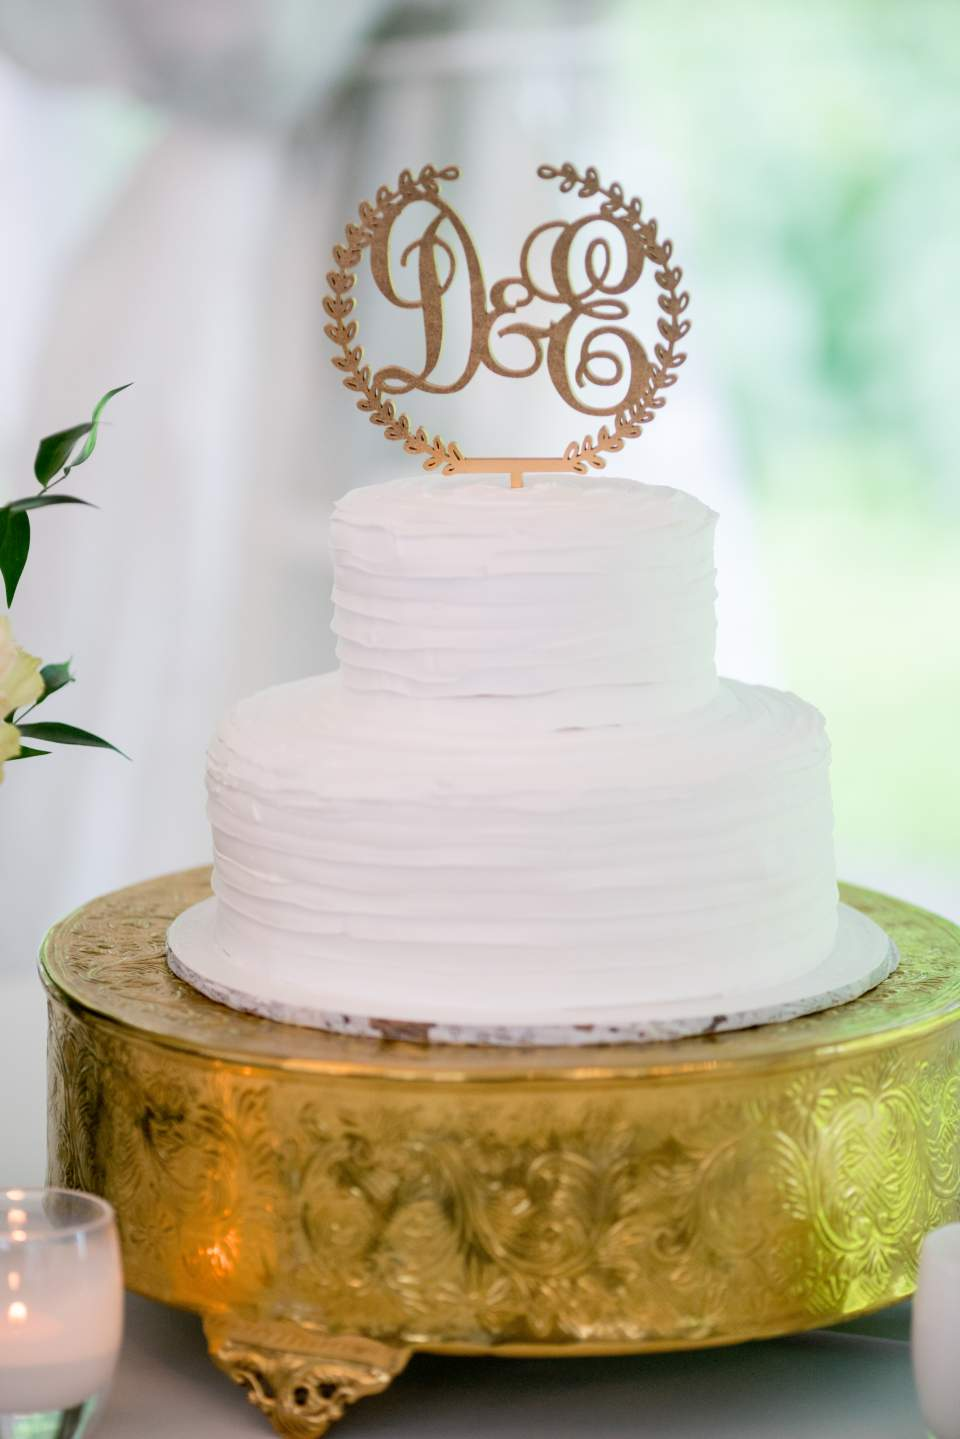 classic white wedding cake with monogram cake topper